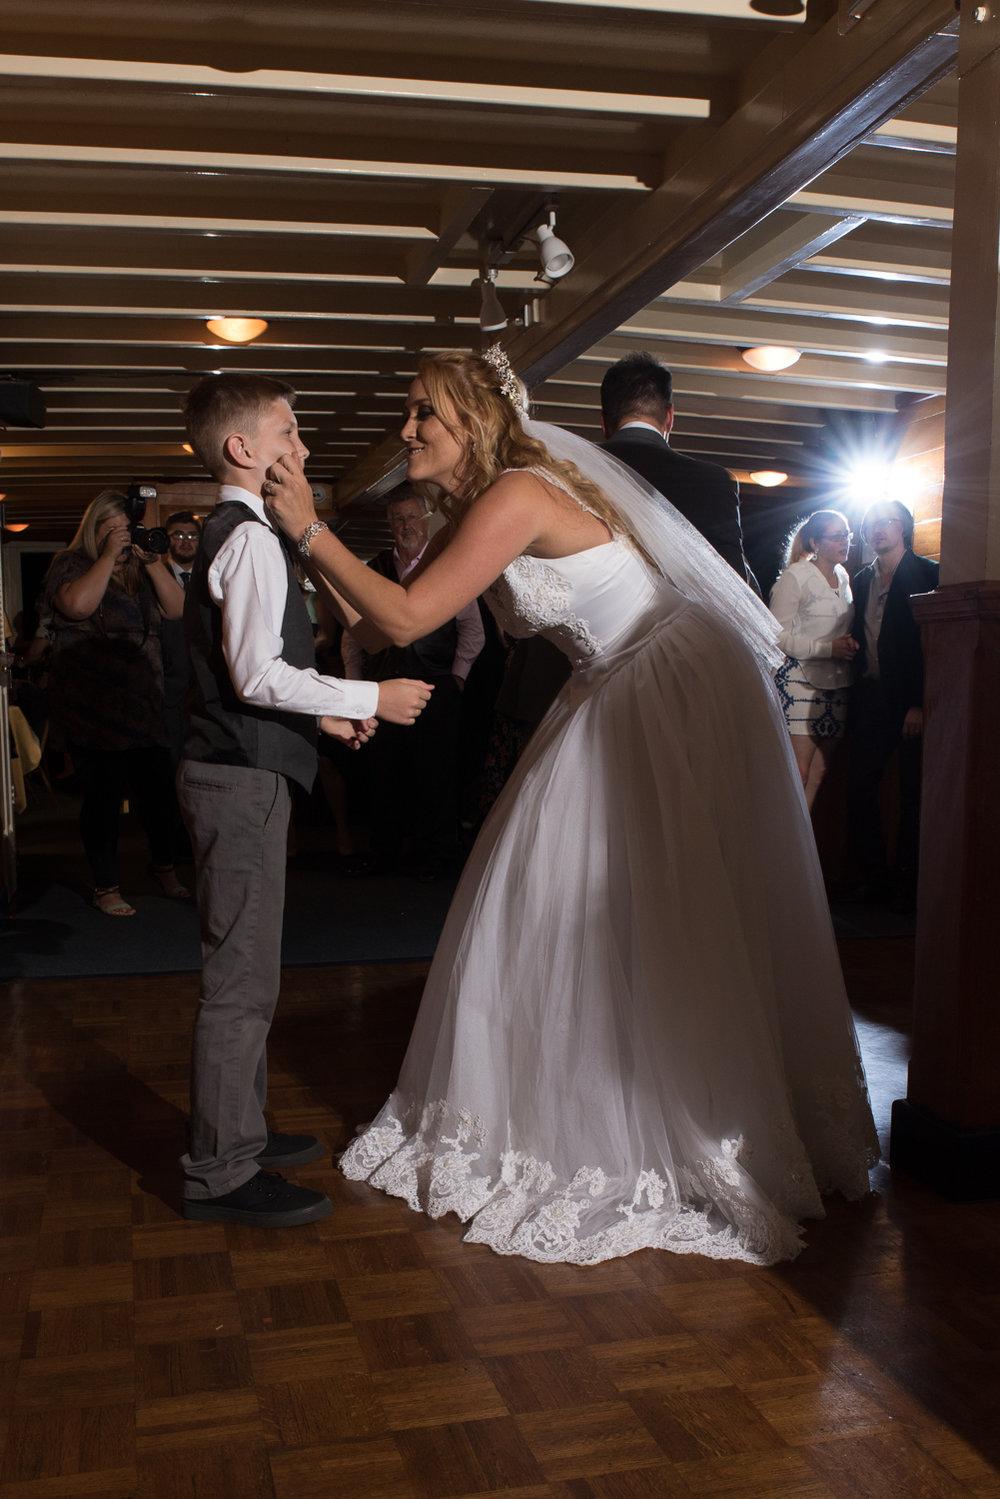 2016_September_04-nomad_lola_wedding_secondshooter-27835.jpg